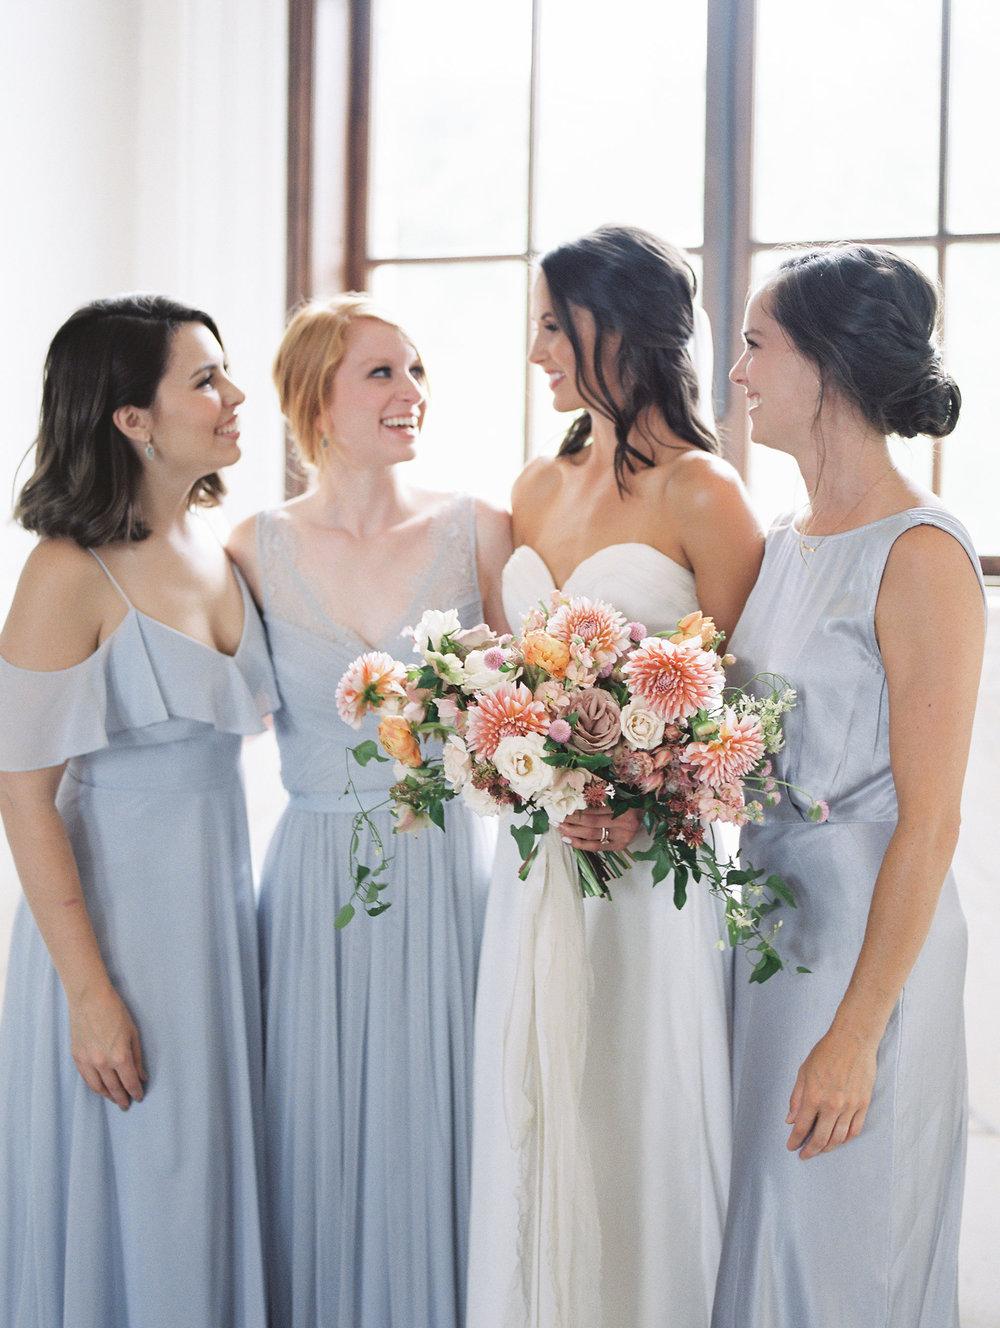 www.hannahforsberg.com-delkab-court-house-wedding-decatur-atlanta-wedding-photographer-156.jpg